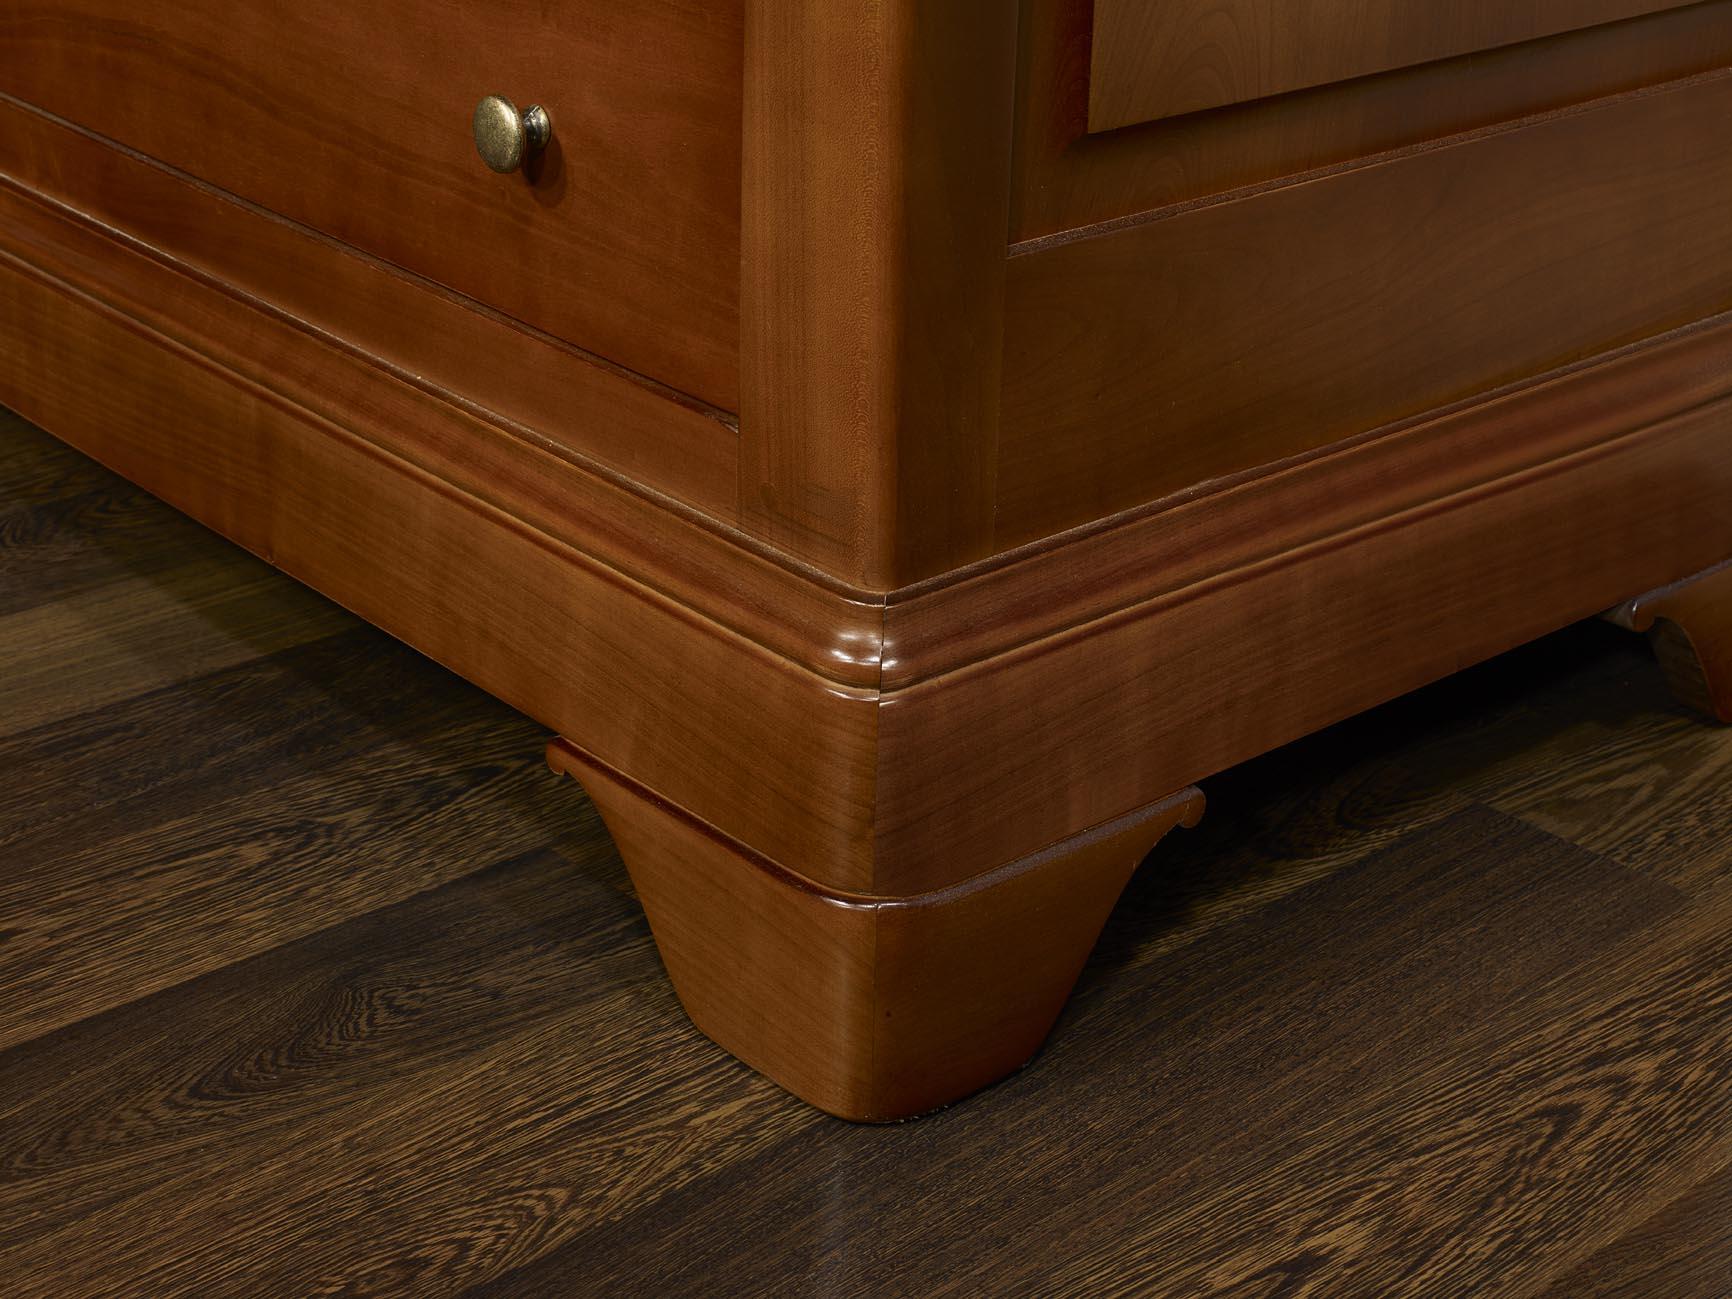 commode 7 tiroirs en merisier massif de style louis philippe meuble en merisier massif. Black Bedroom Furniture Sets. Home Design Ideas